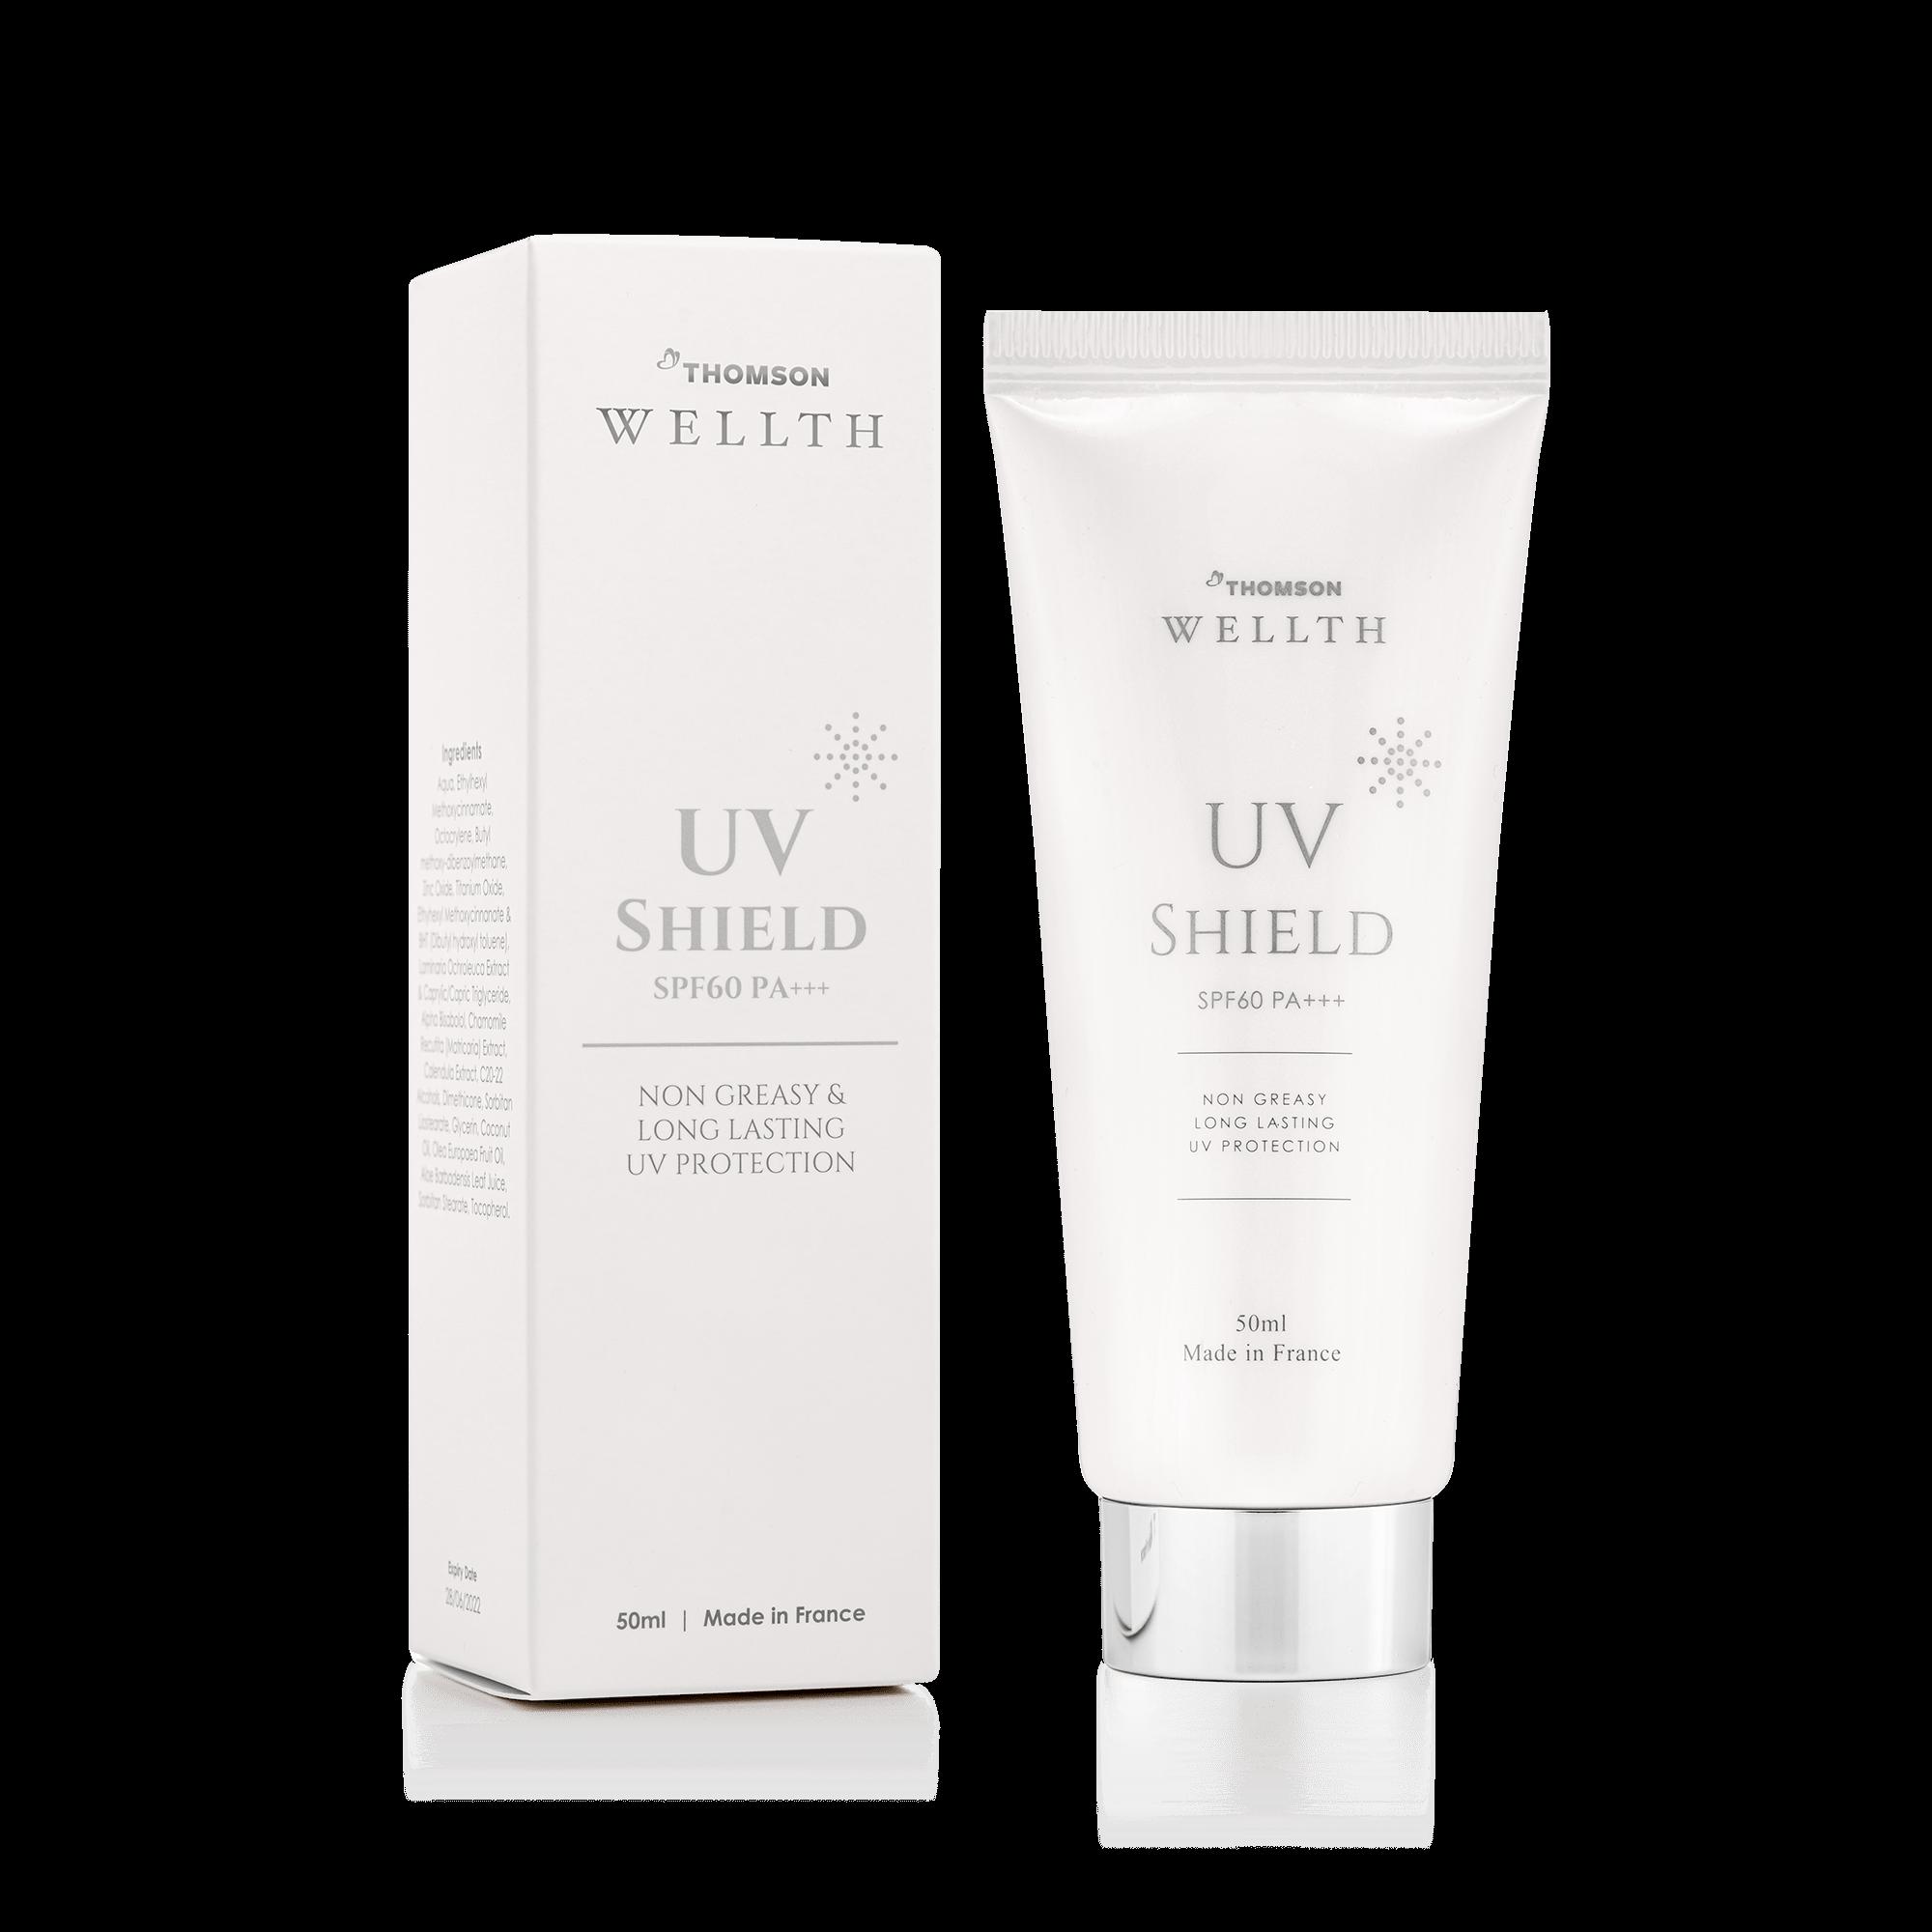 Thomson Wellth UV Shield Skincare Product